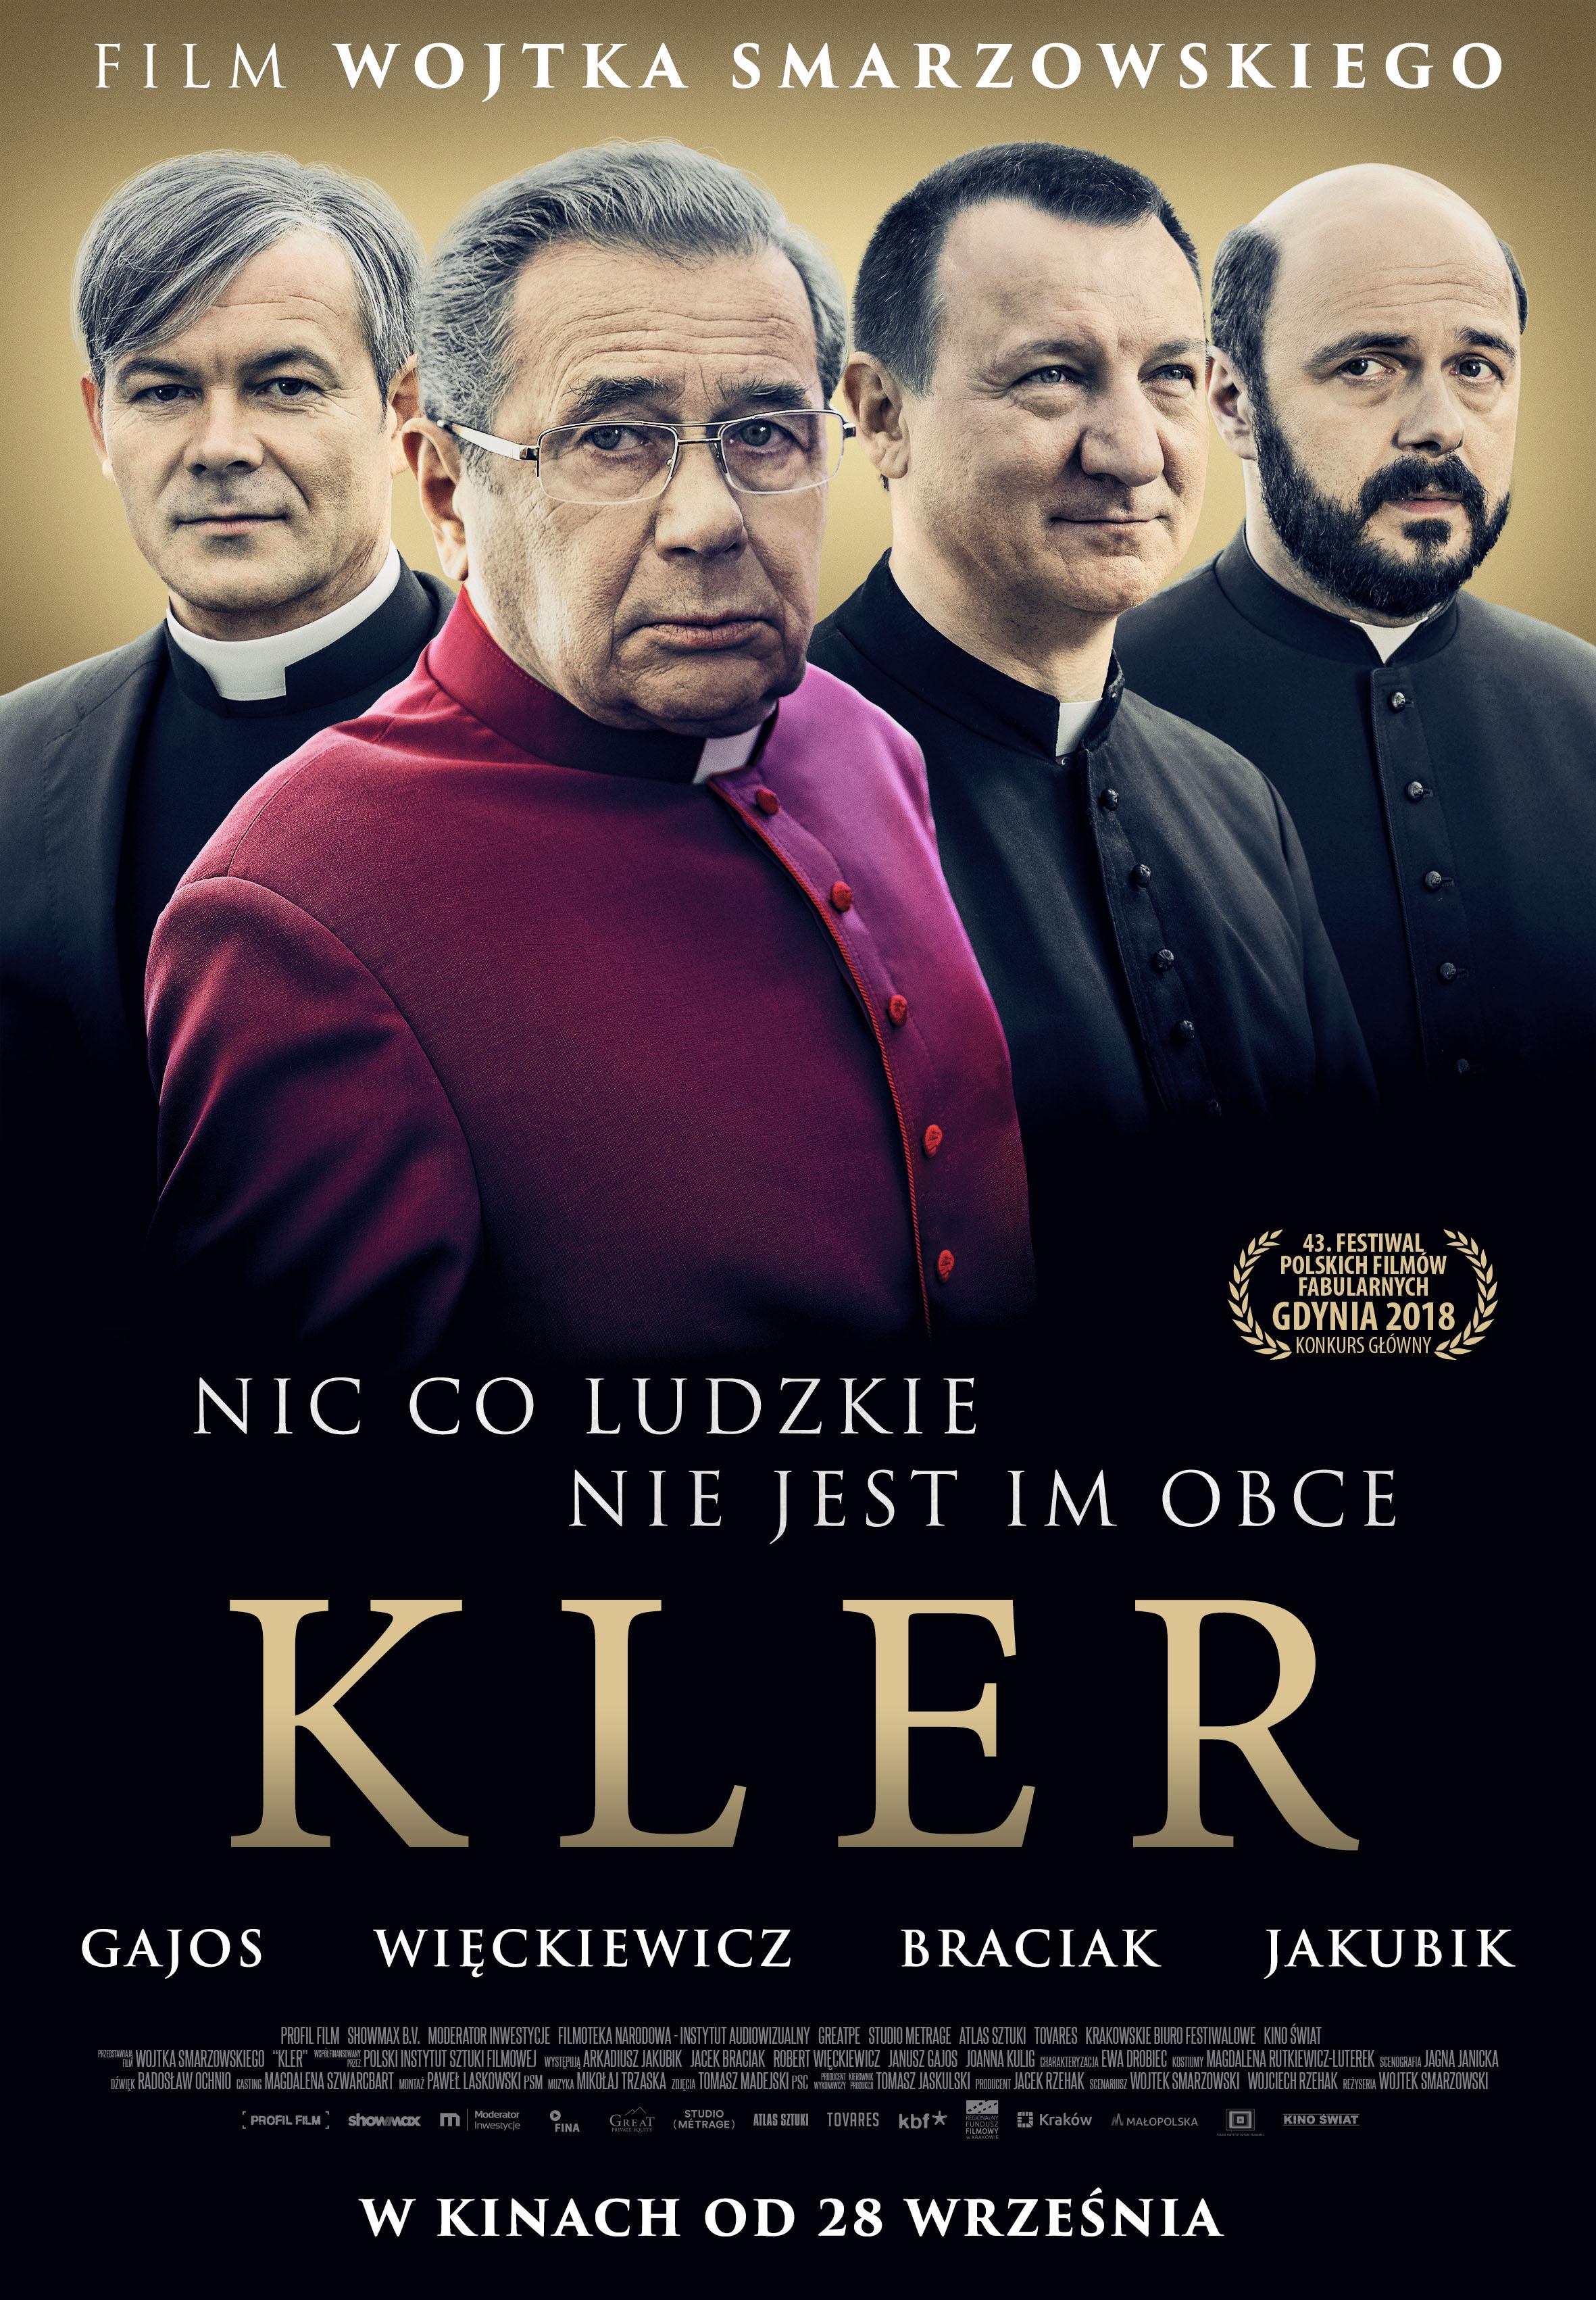 Janosikowy Klub Seniora: Kler